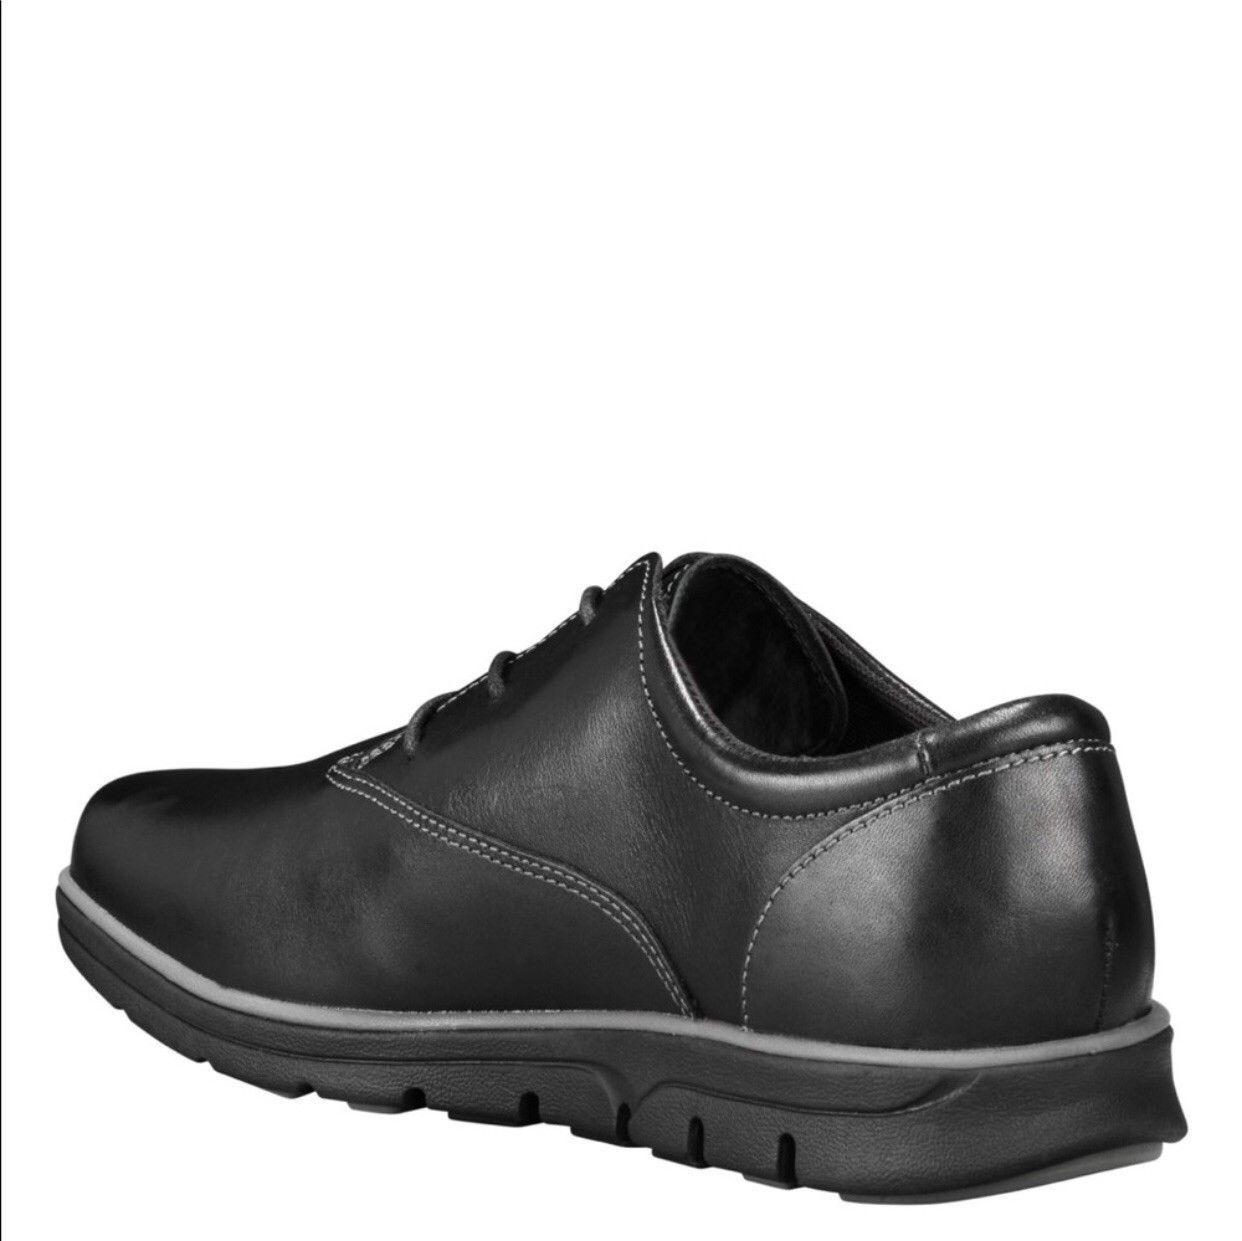 Men's Bradstreet Brown Leather Oxford Shoes